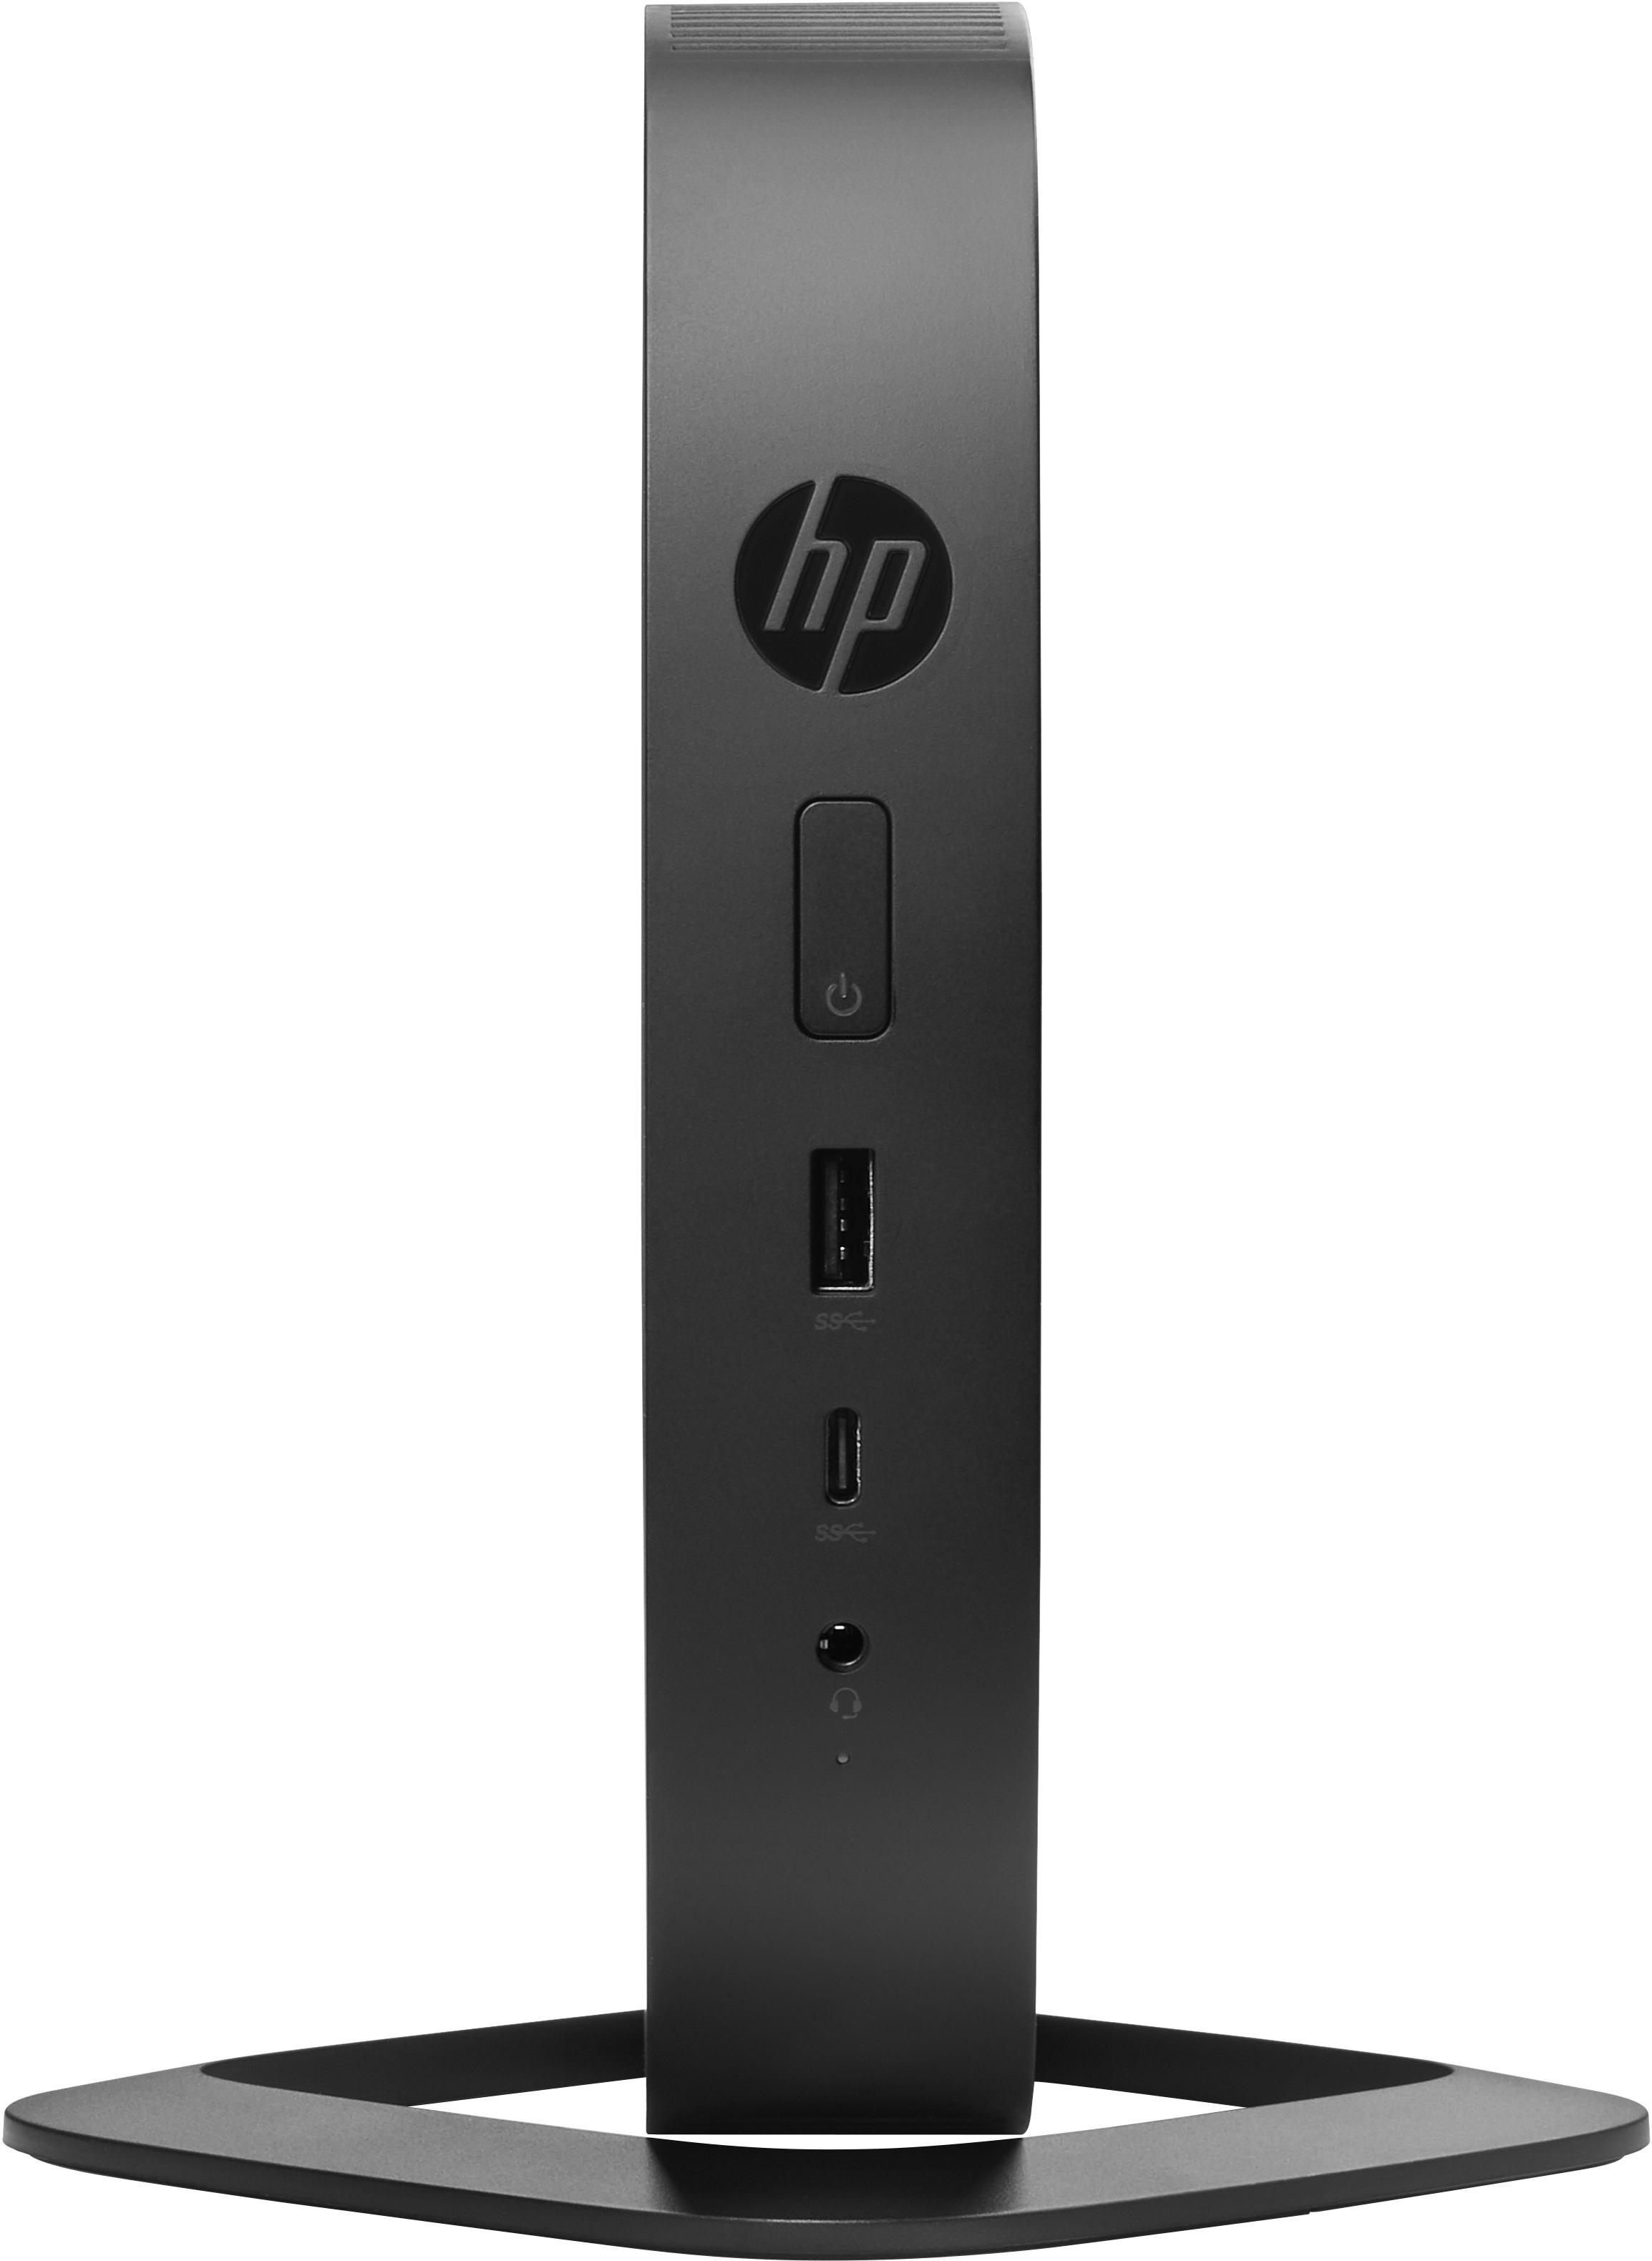 2022274-HP-t530-1-5-GHz-GX-215JJ-Nero-960-g-T530-AMD-GX-215JJ-1X4GB-AMD-GX-21